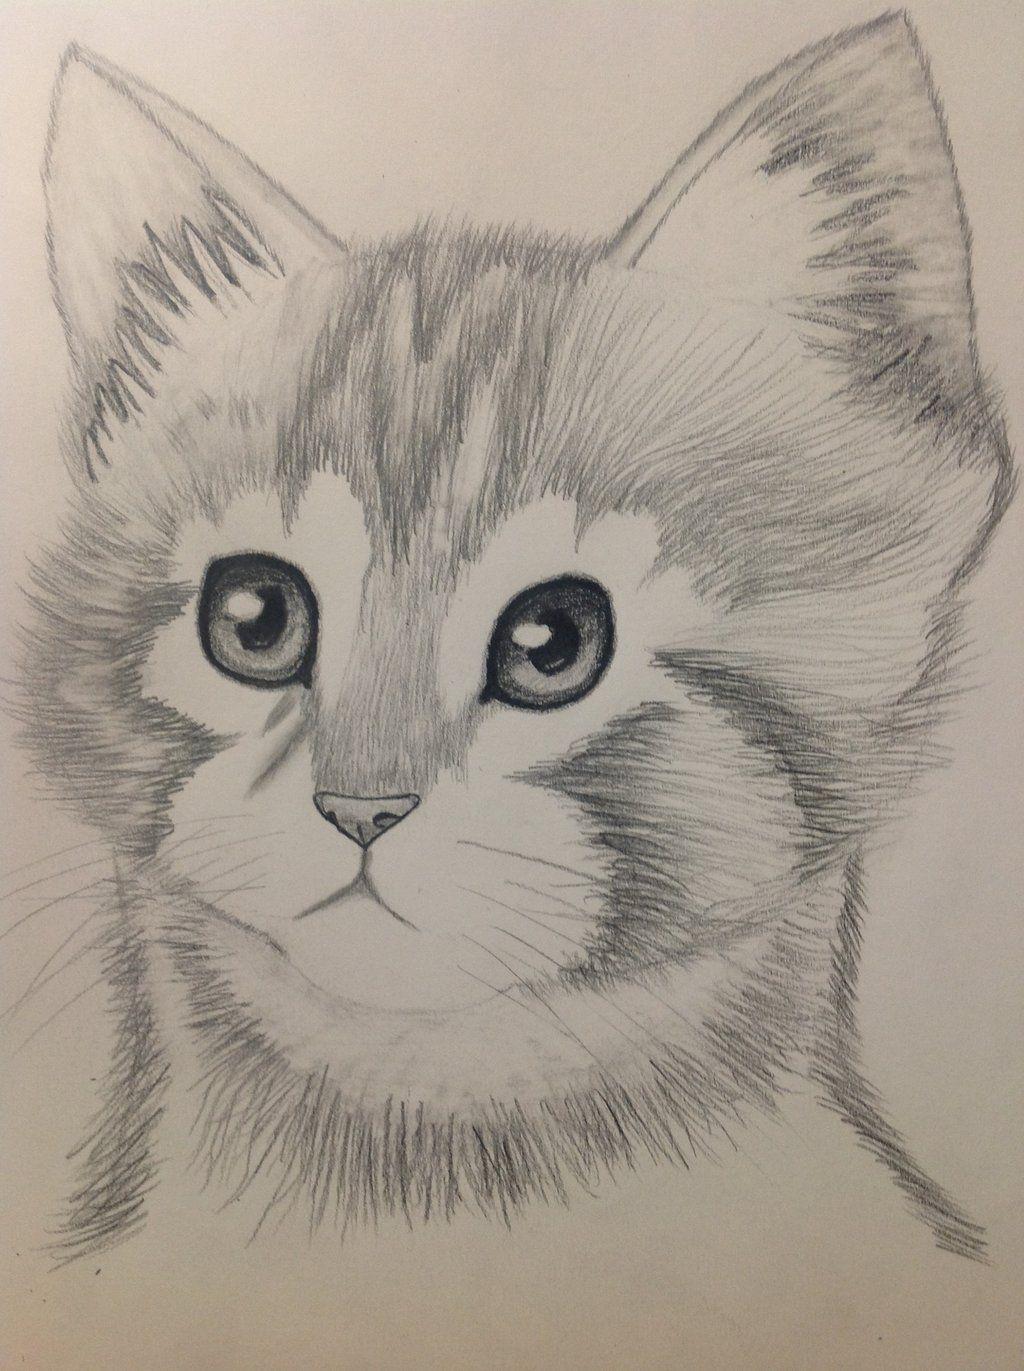 Pencil sketches of animals pencil drawing pictures cartoon pencil drawing pictures to draw